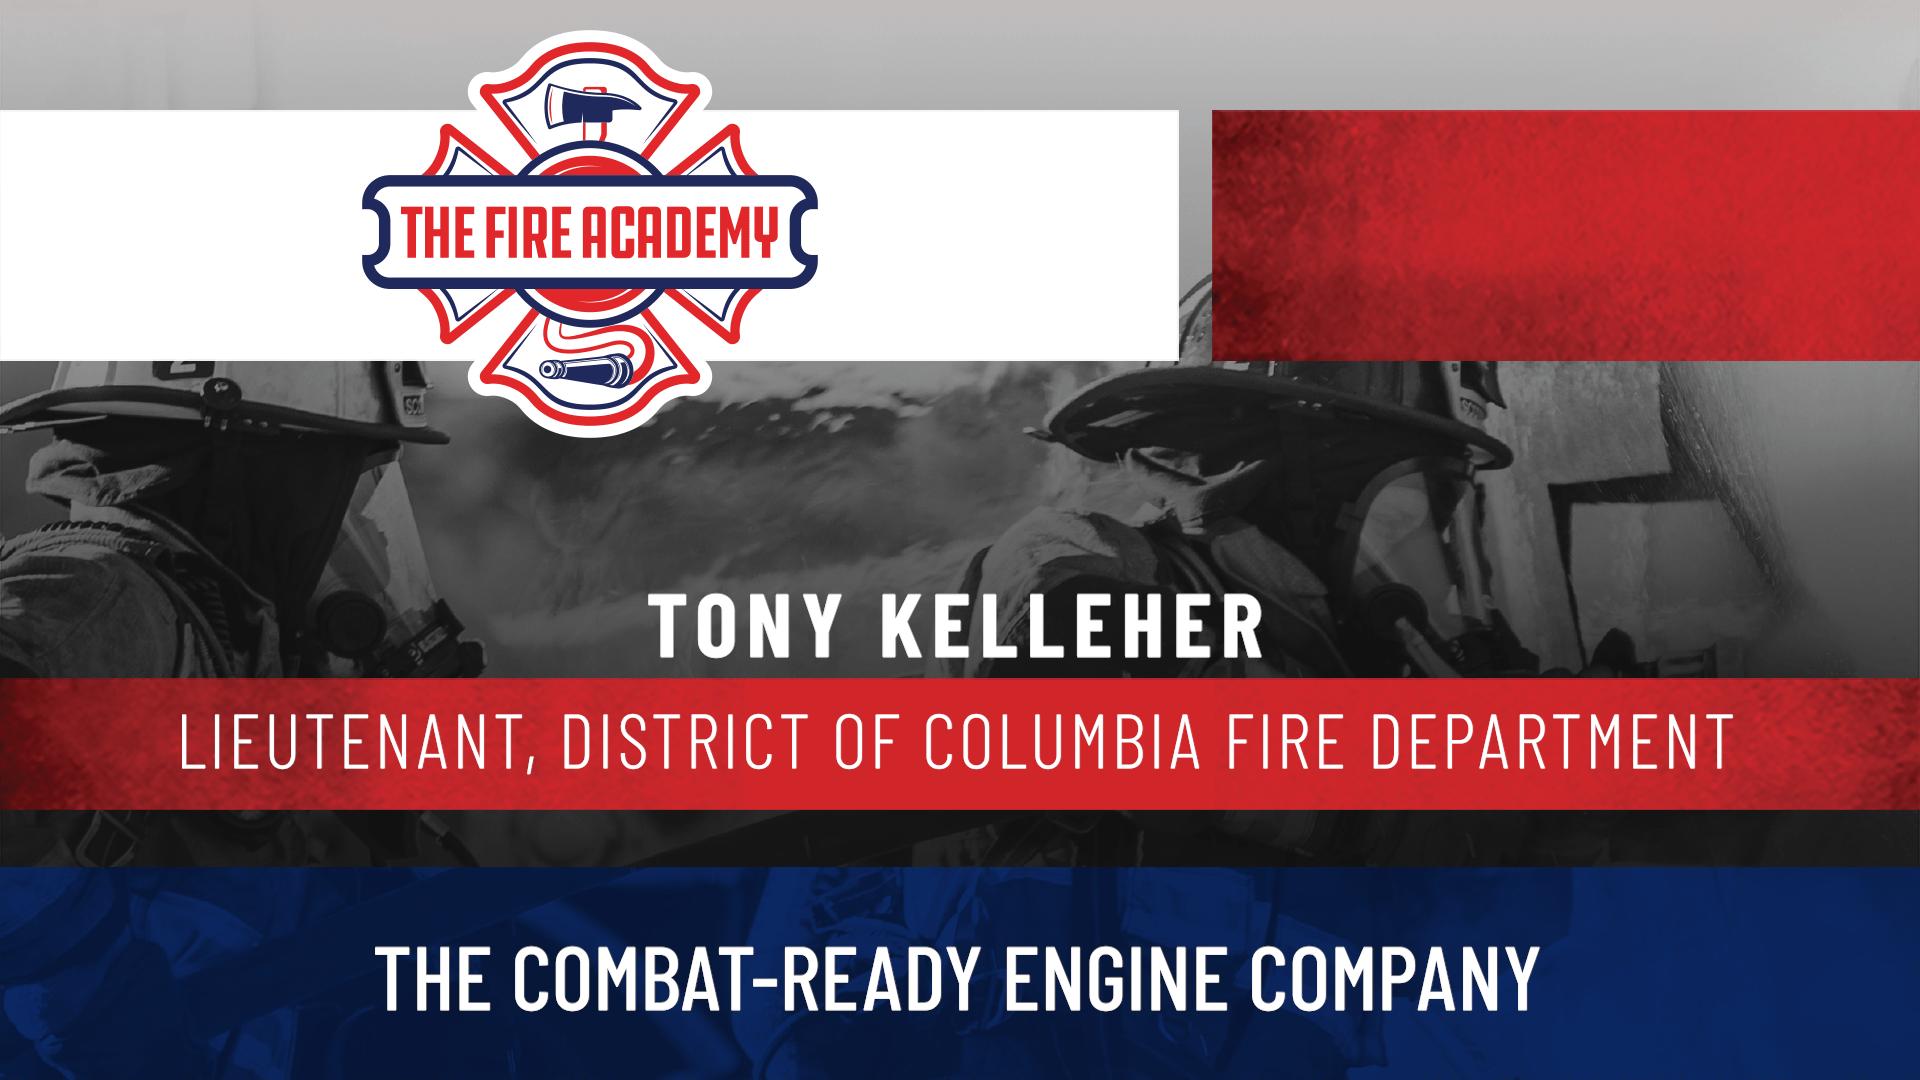 The Combat-Ready Engine Company